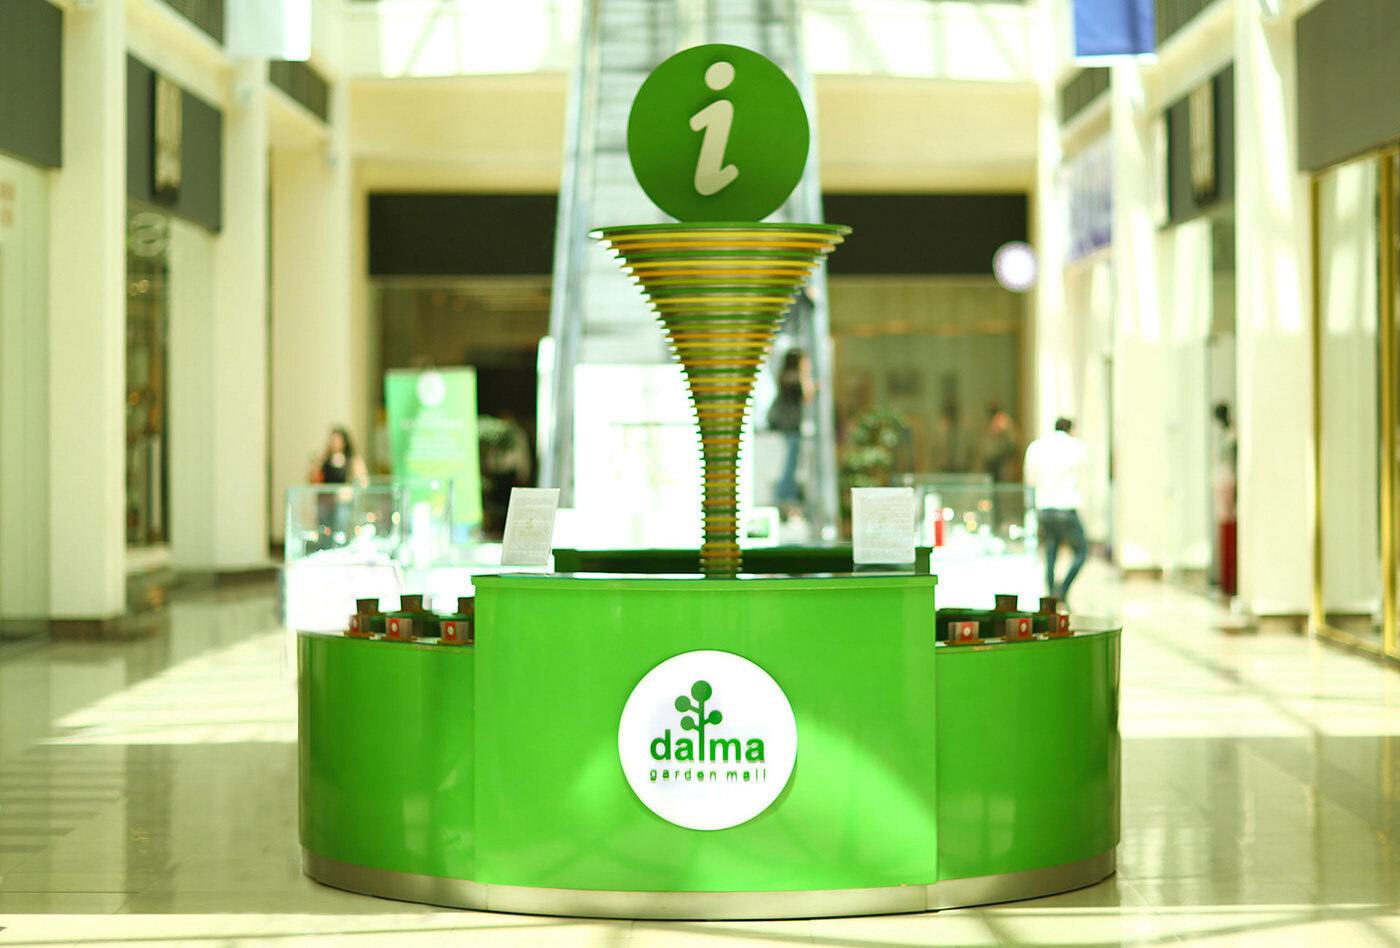 info-center-dalma